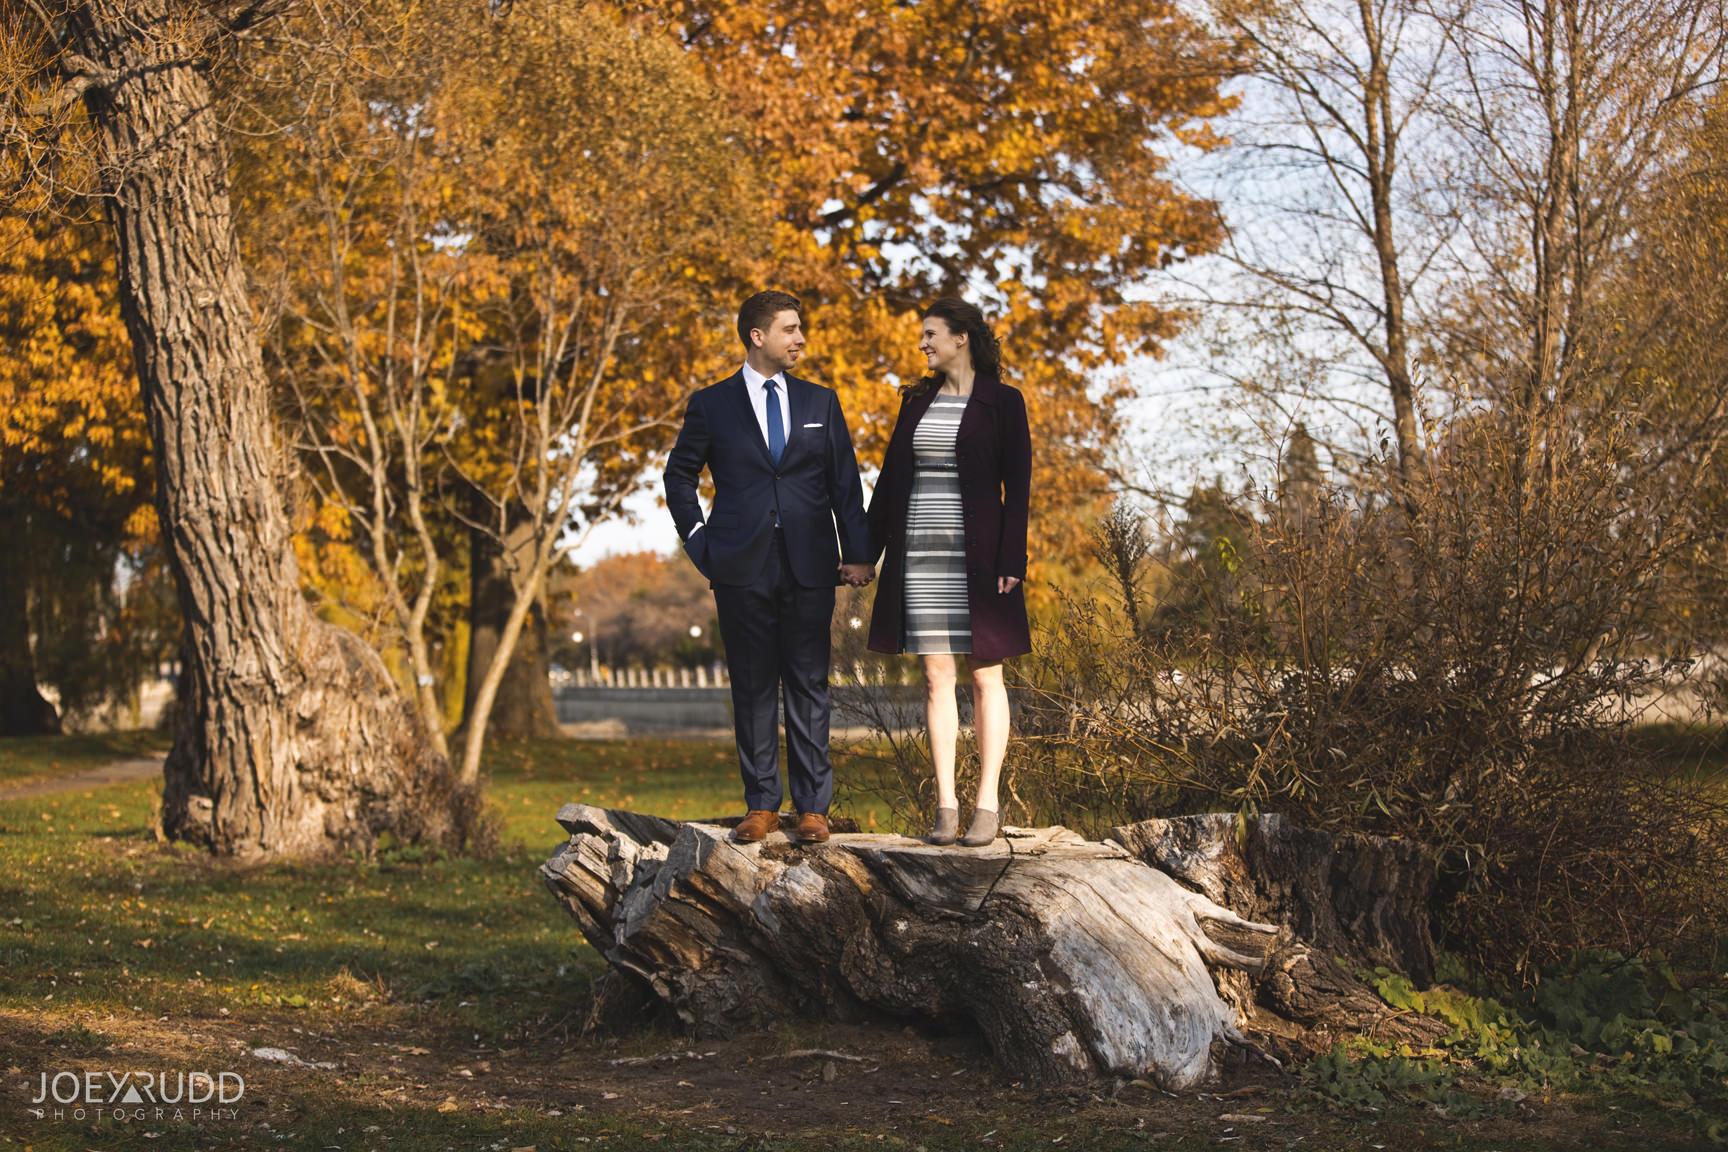 Ottawa Elopement by Joey Rudd Photography Ontario Wedding Photographer Fun Pose